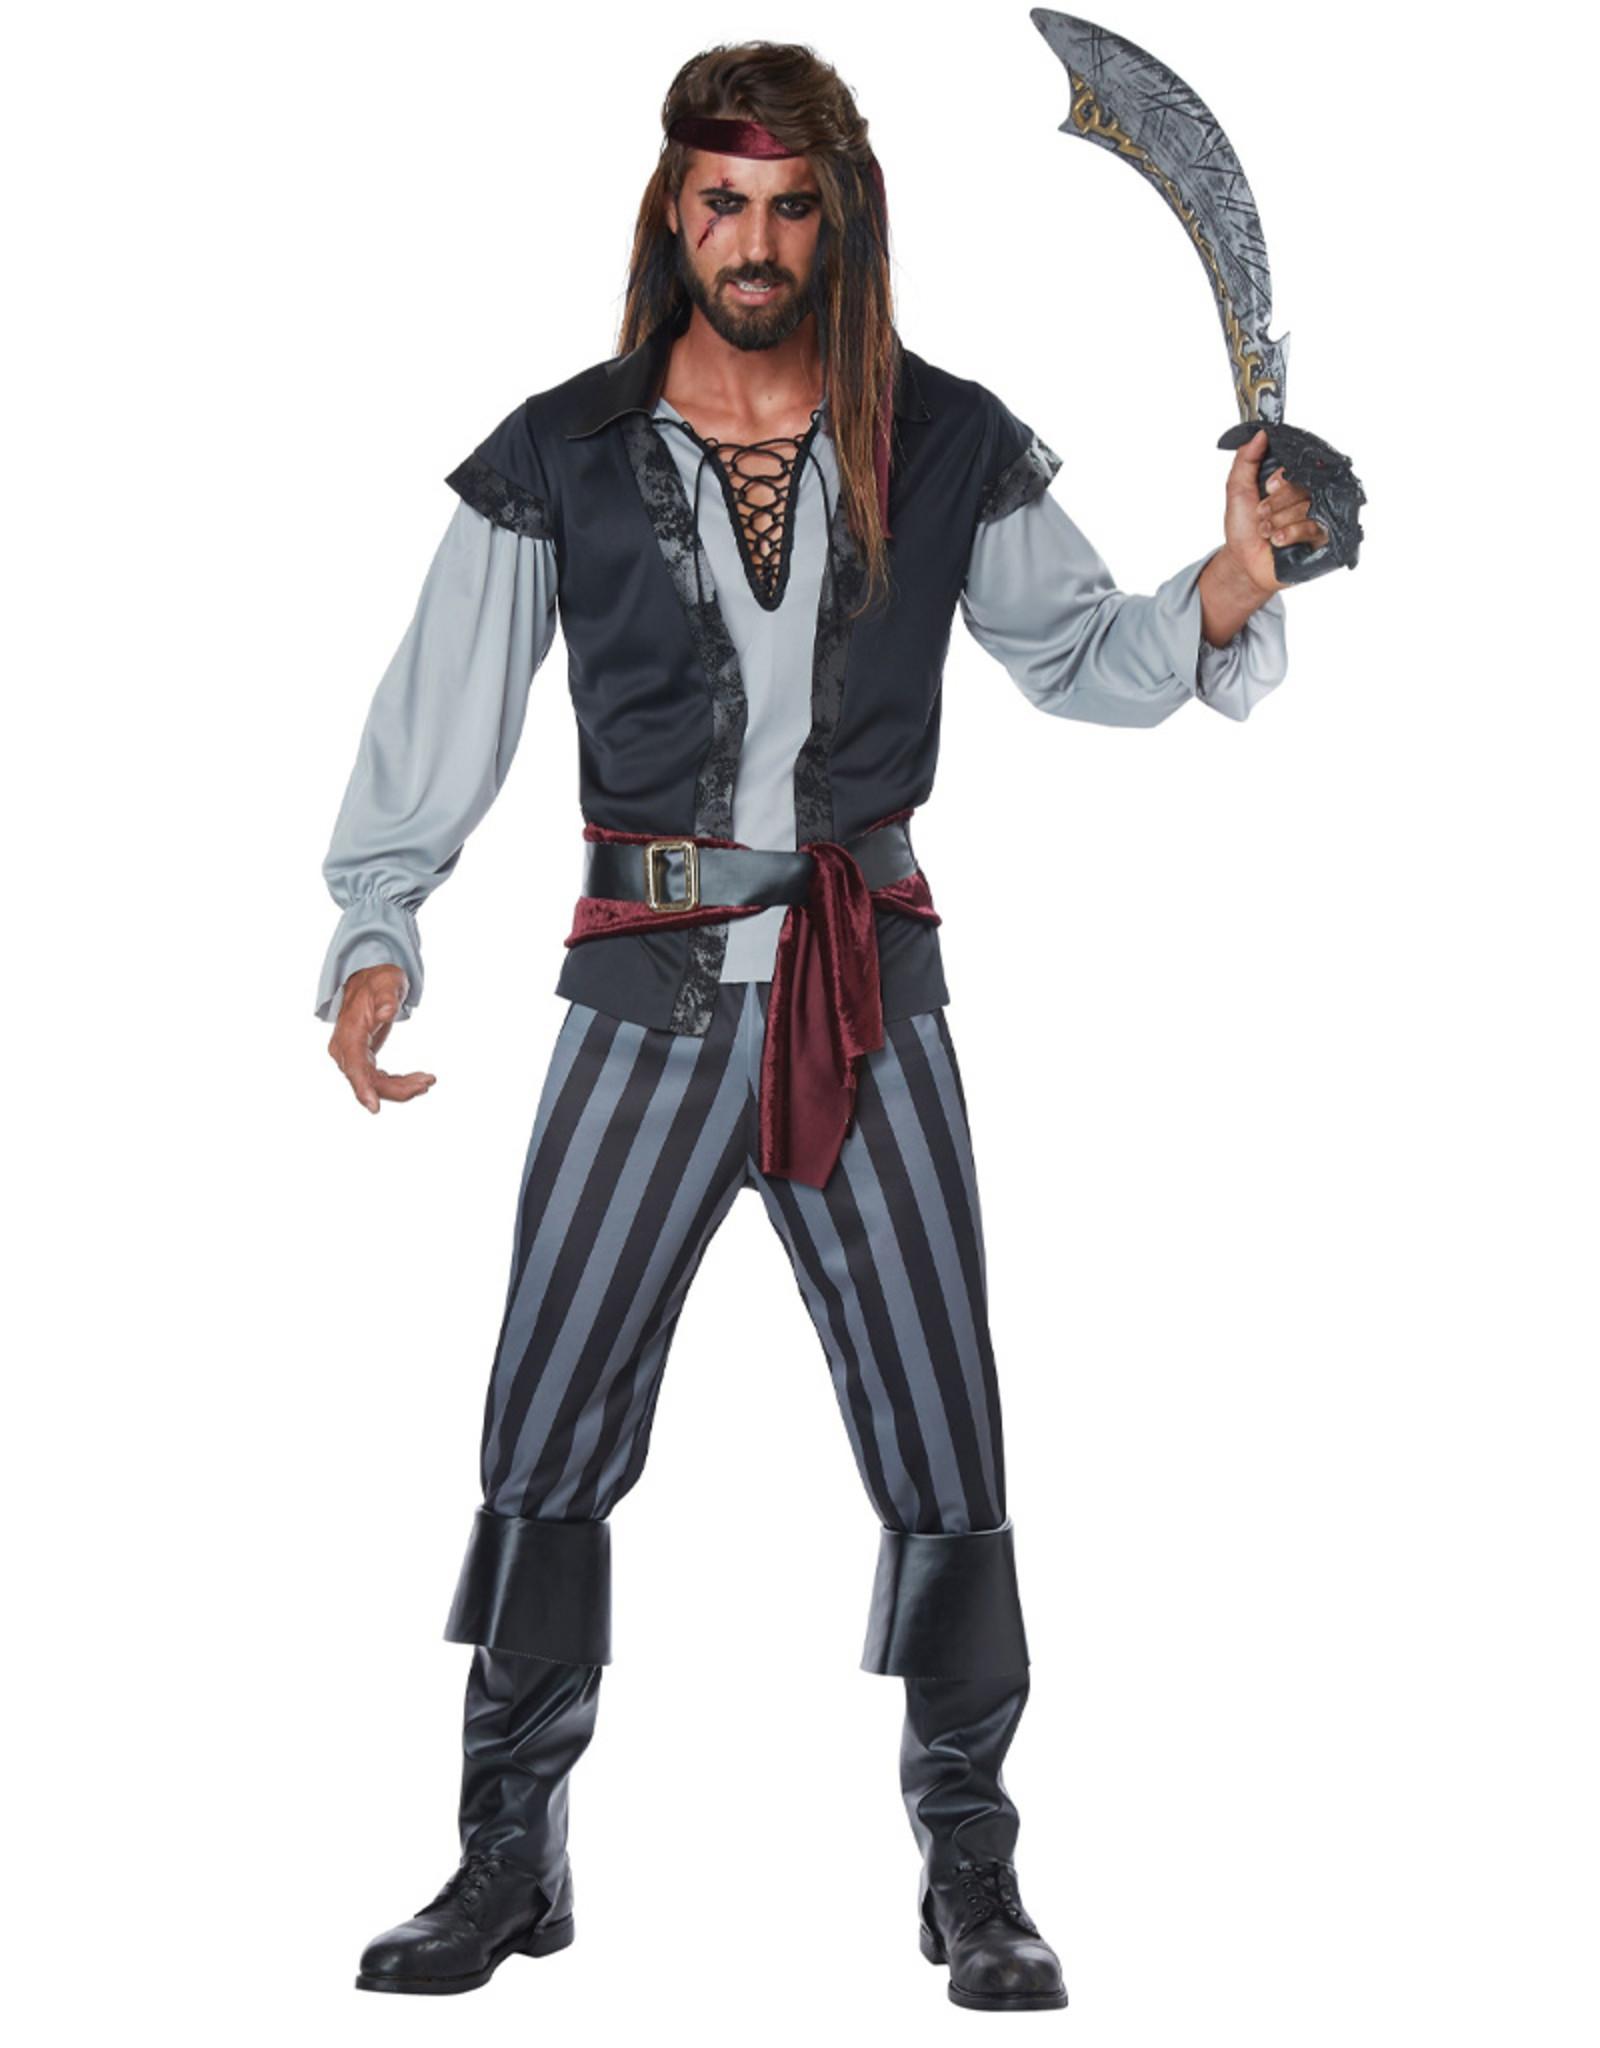 Scallywag Pirate Costume - Men's Plus